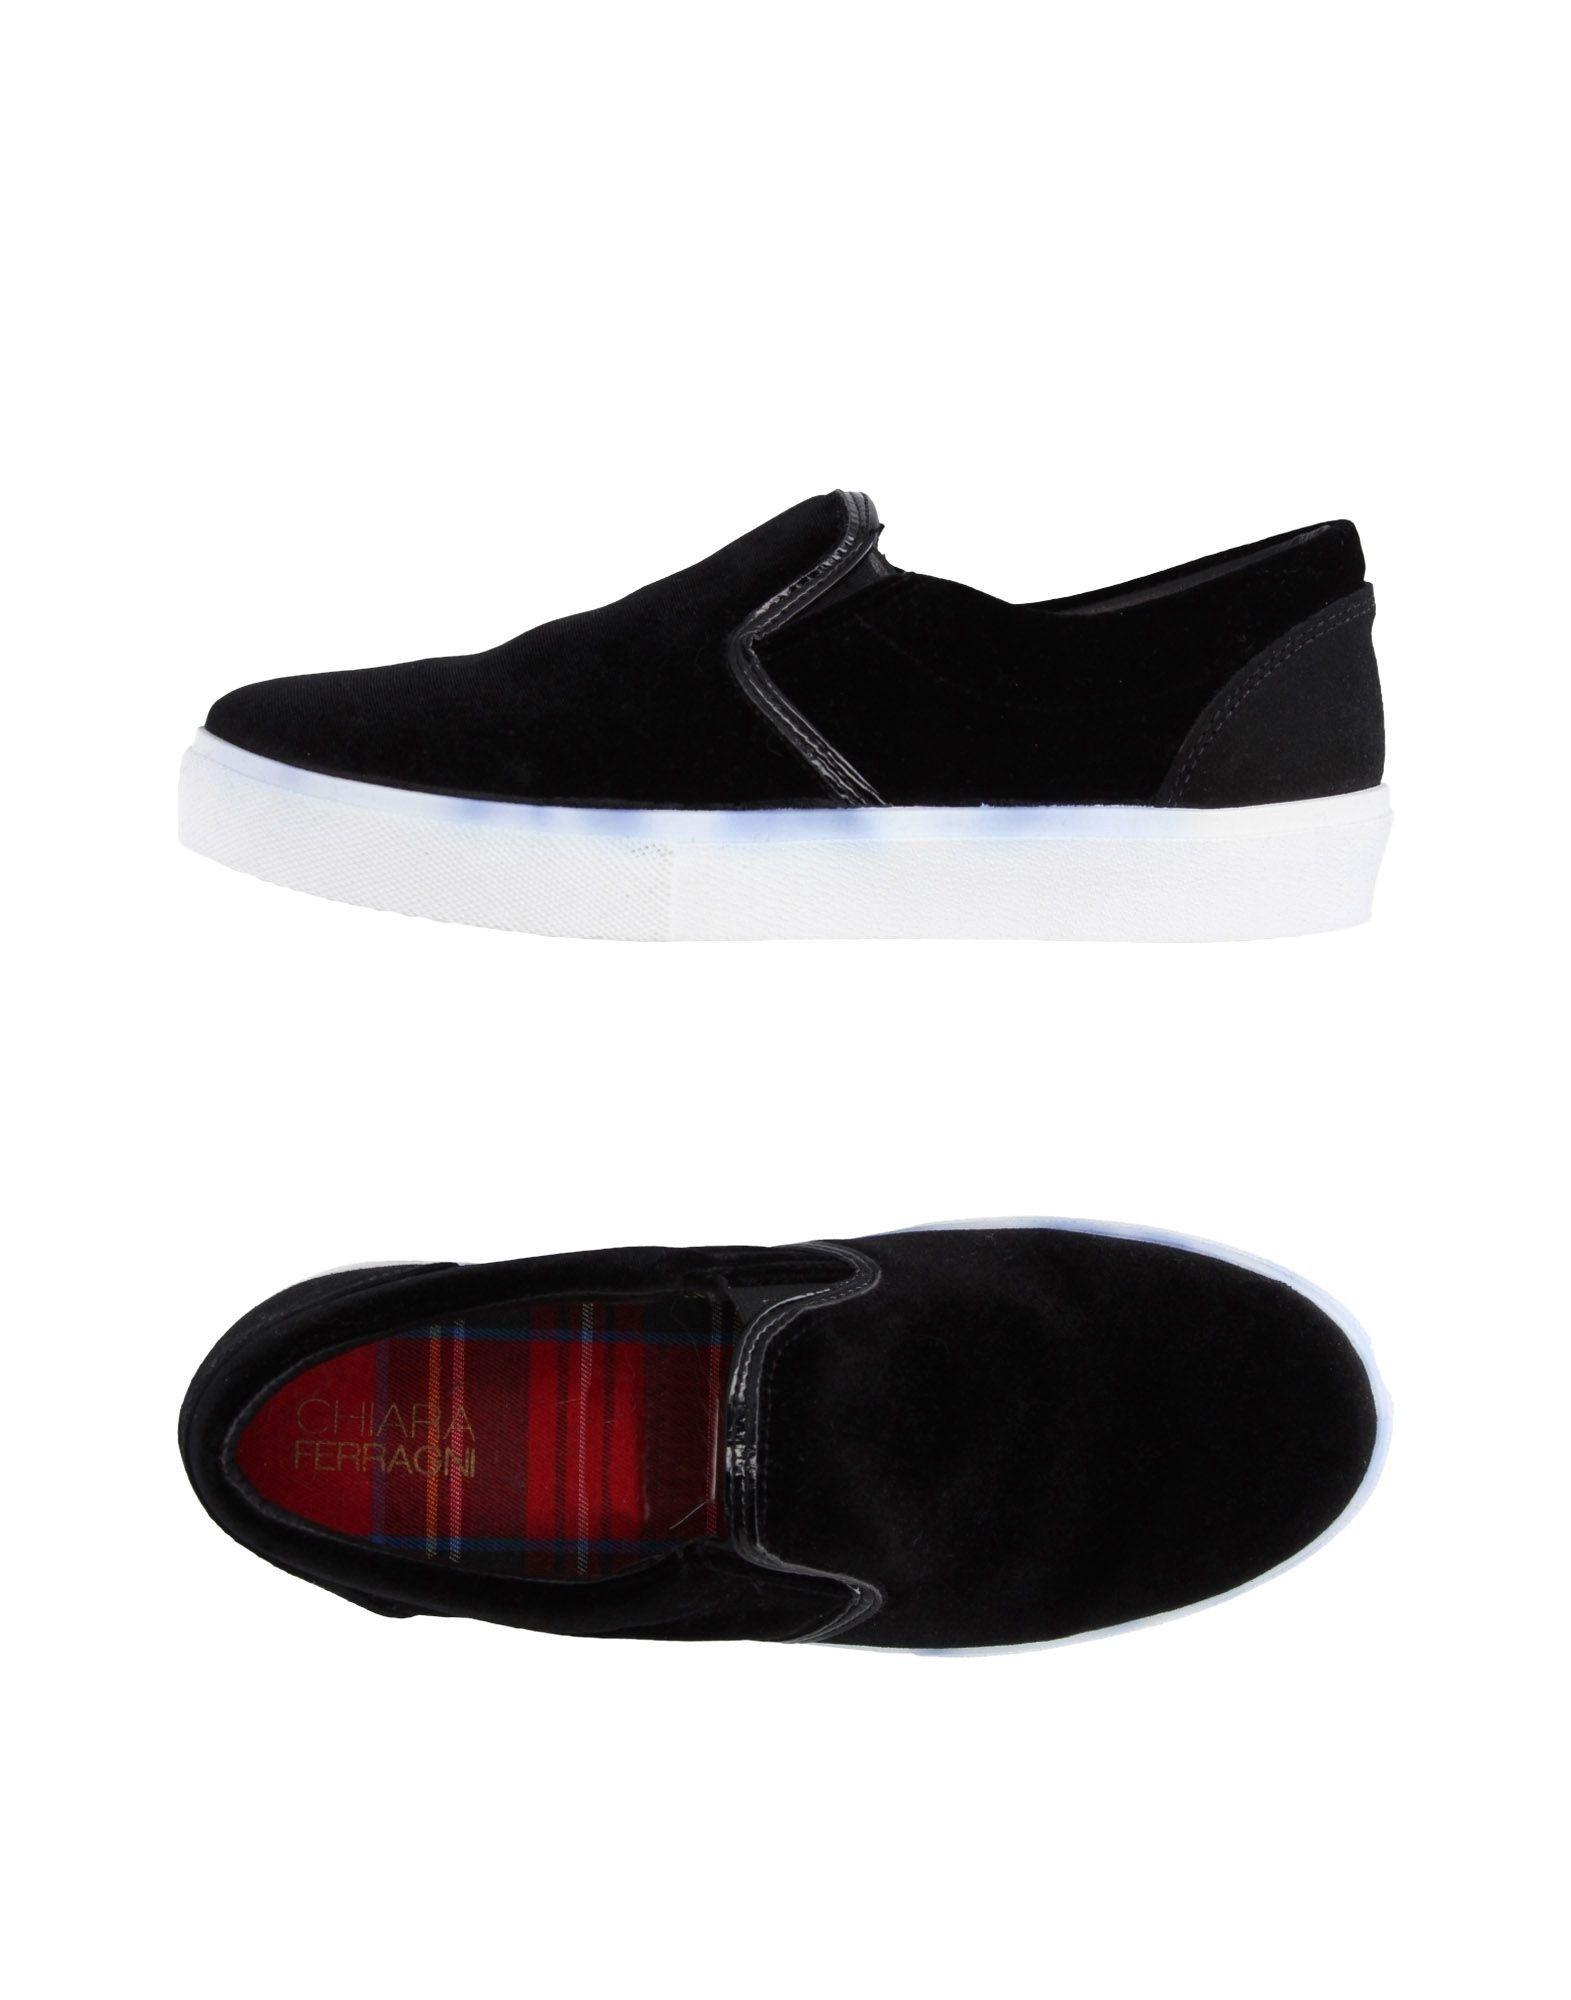 CHIARA FERRAGNI Sneakers by Chiara Ferragni in 2018  478cbaface5